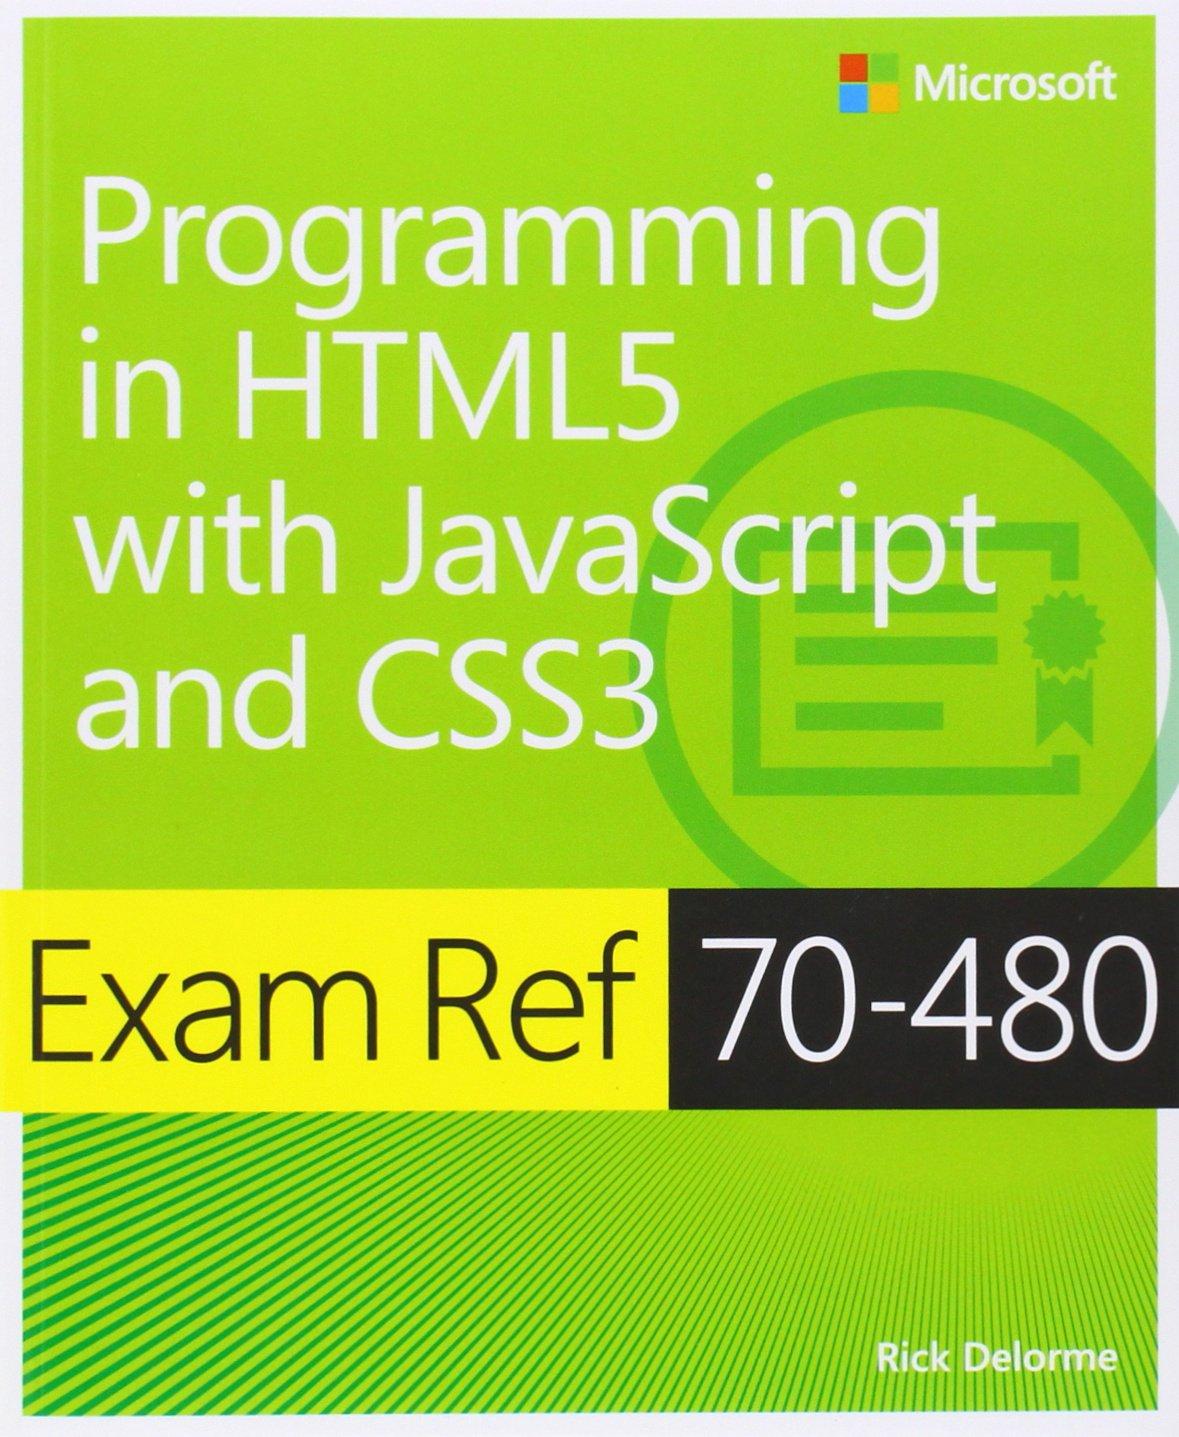 Etl Testing Useful Resources: HTML5 Useful Resources